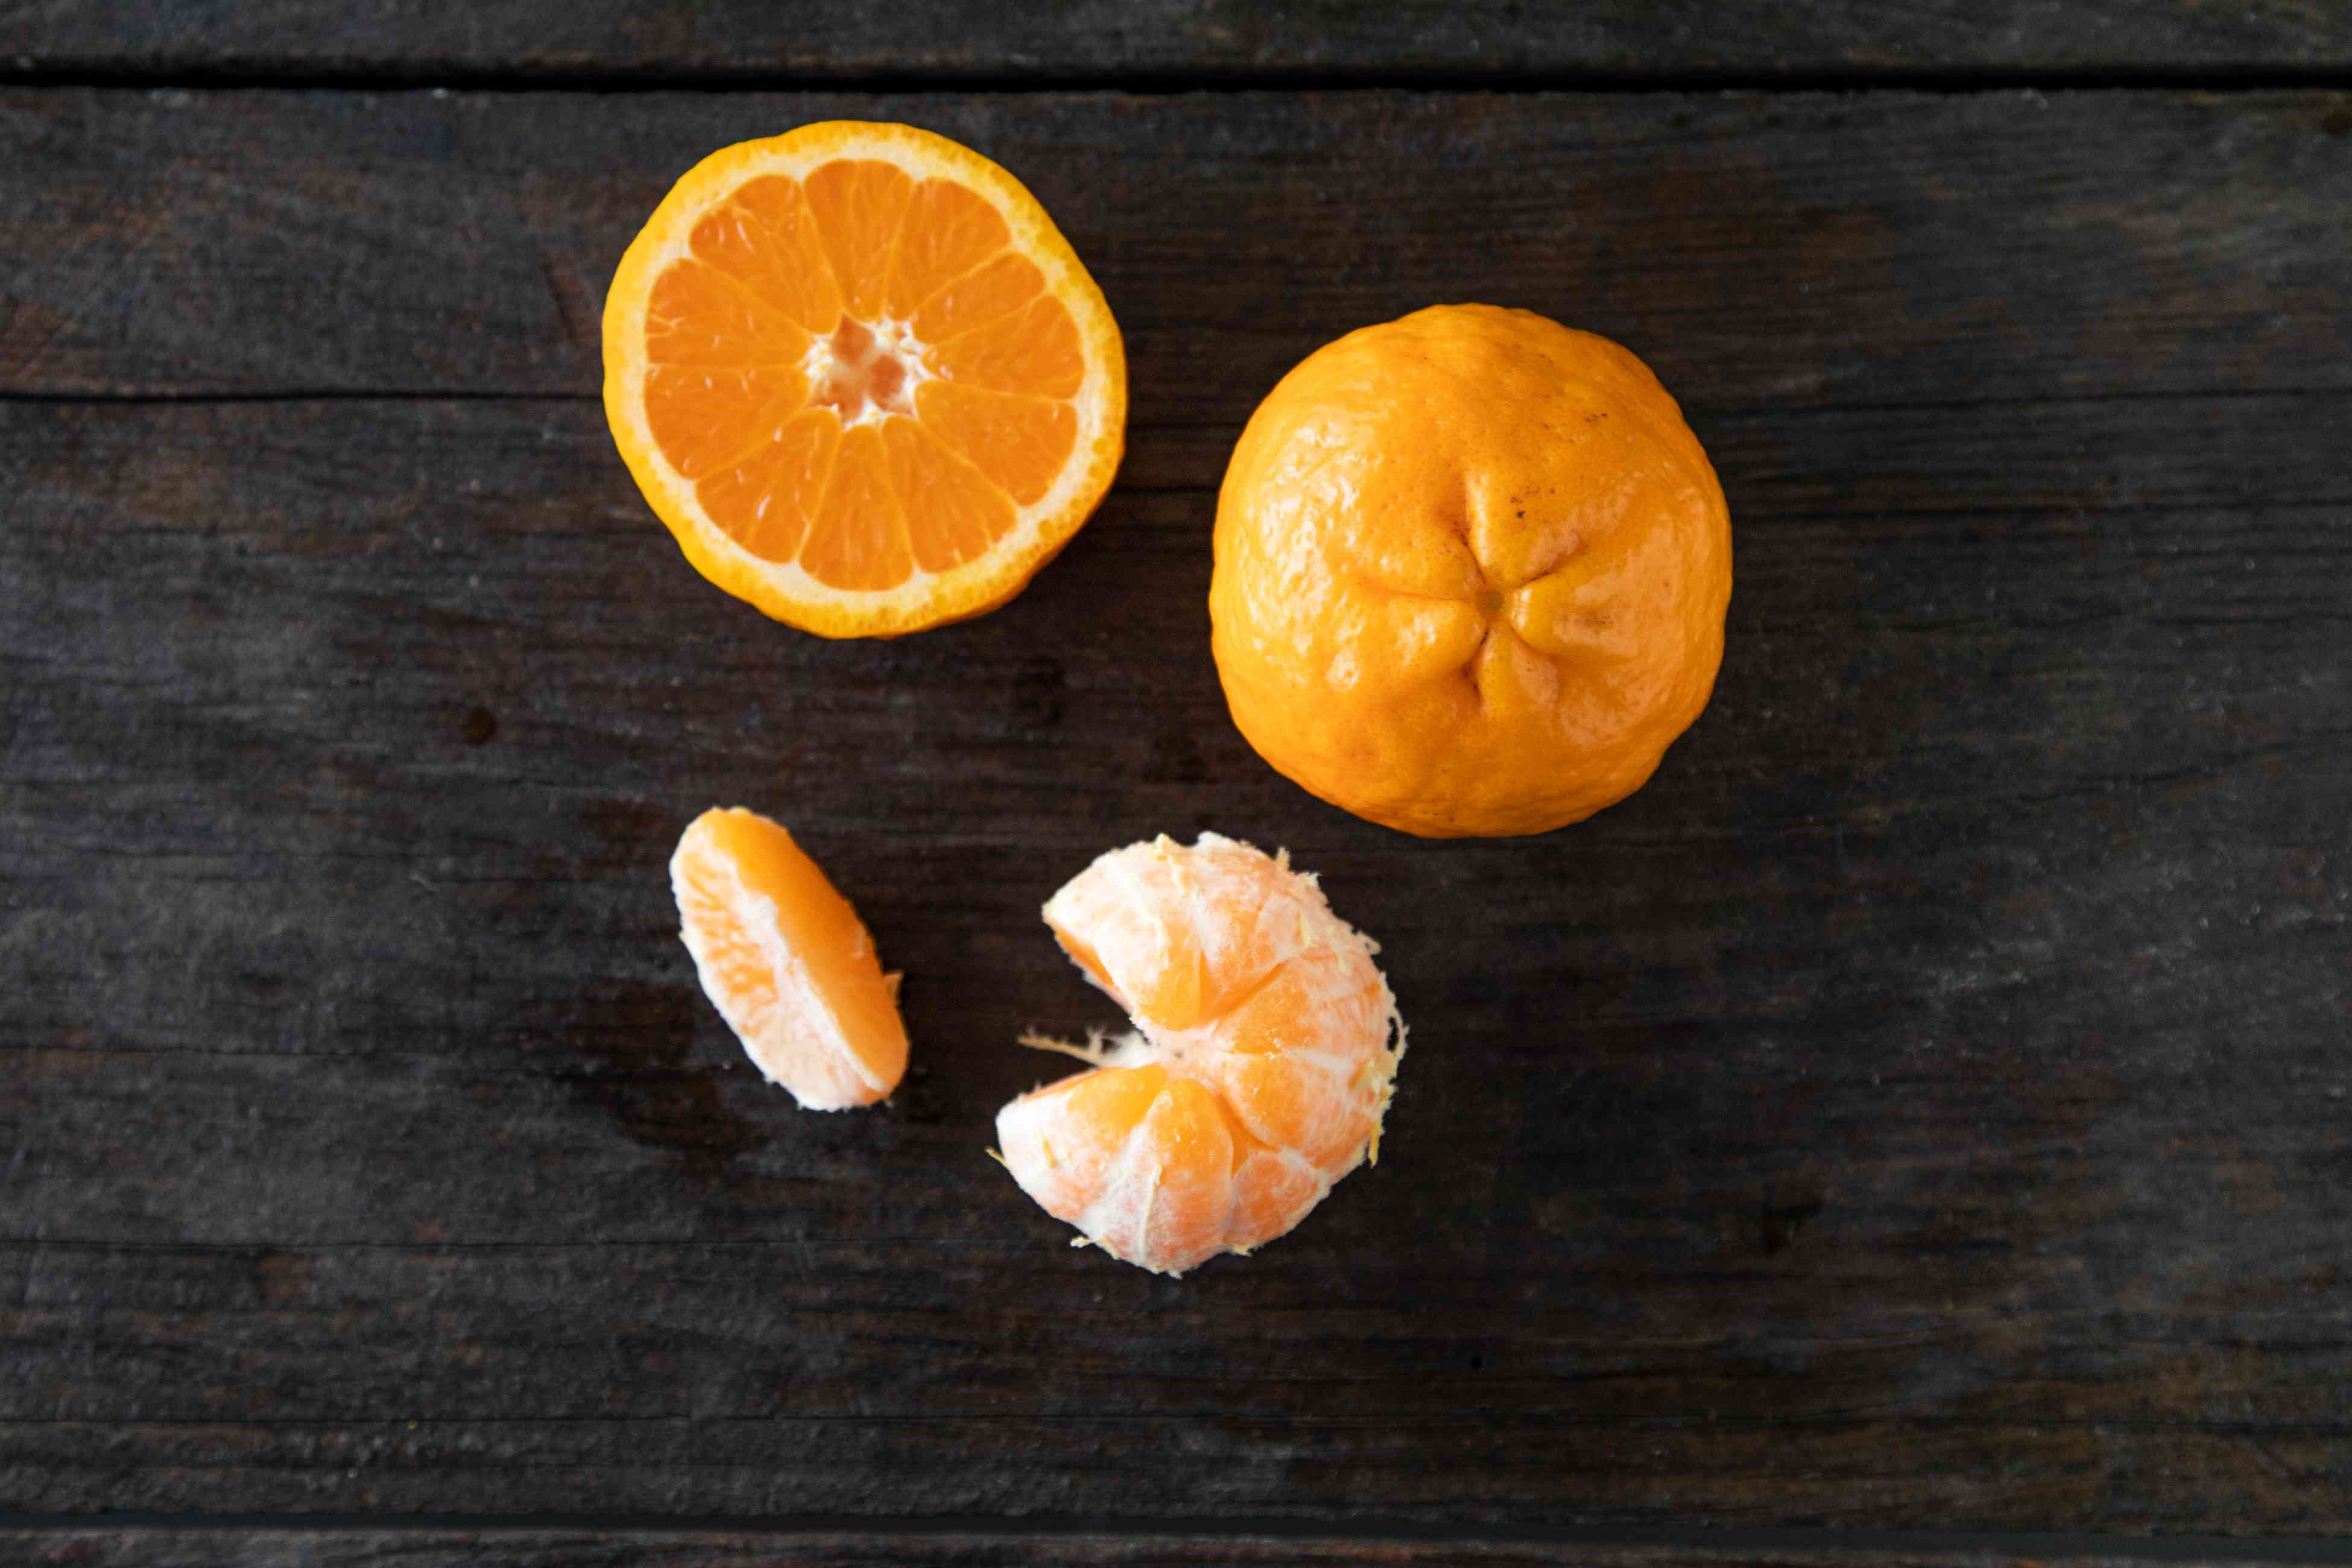 Satsuma mandarin on dark background